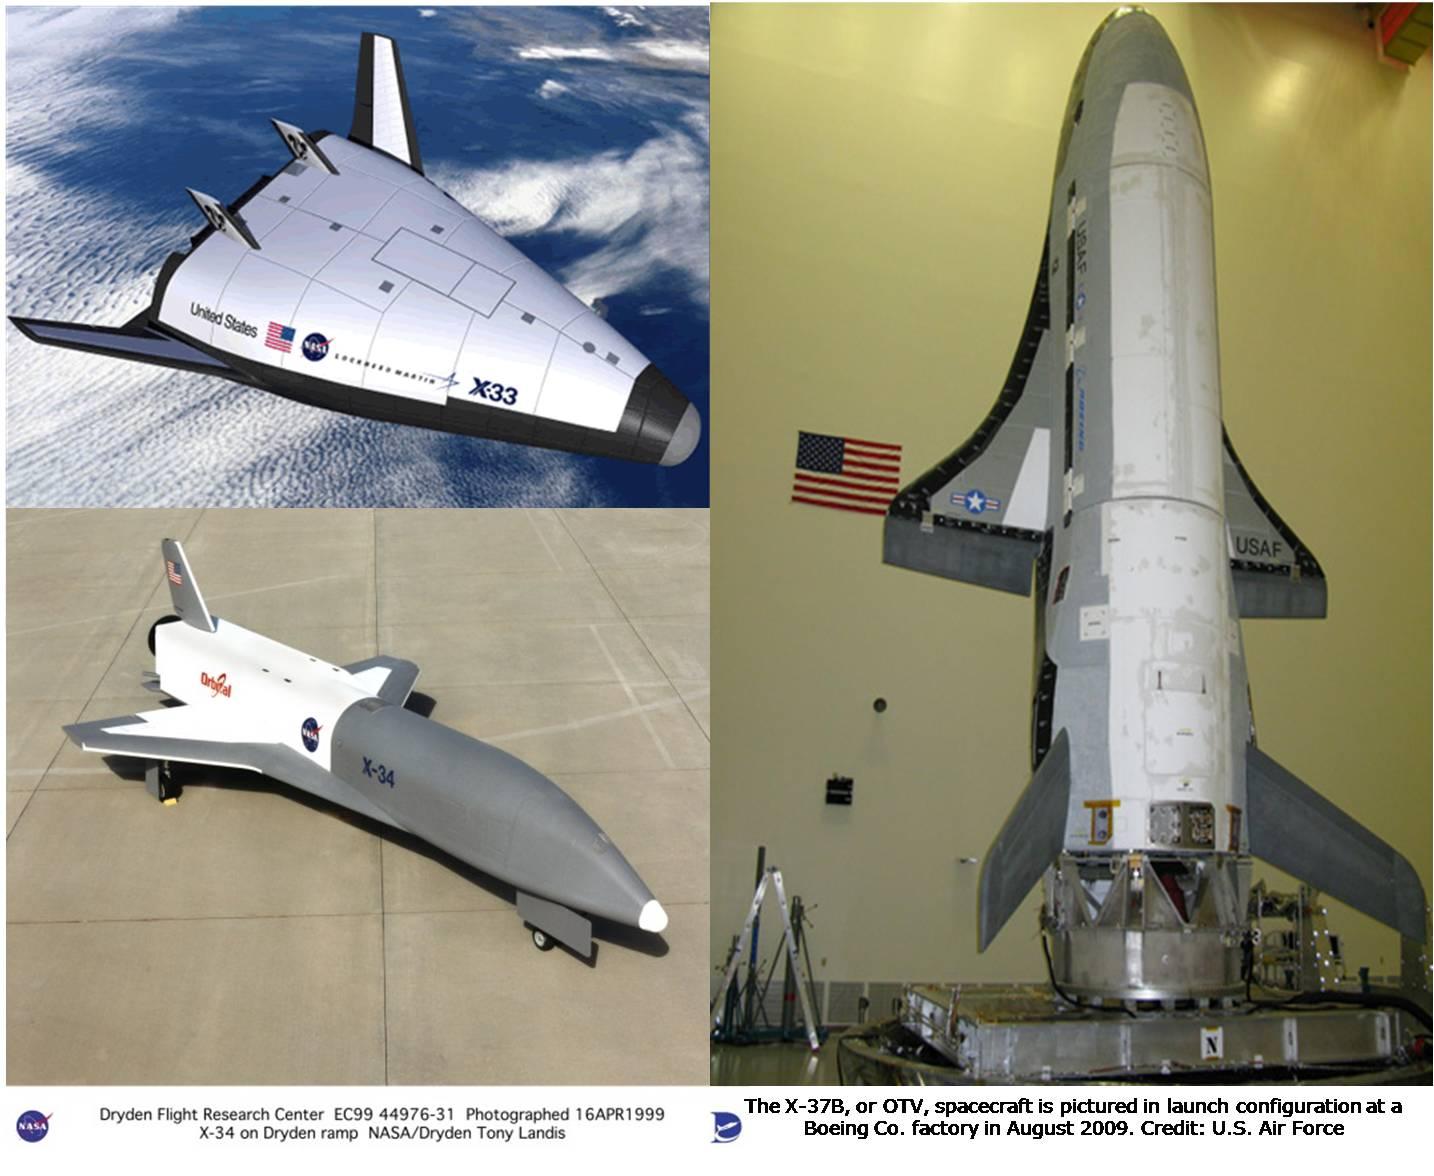 lockheed martin space shuttle - photo #15